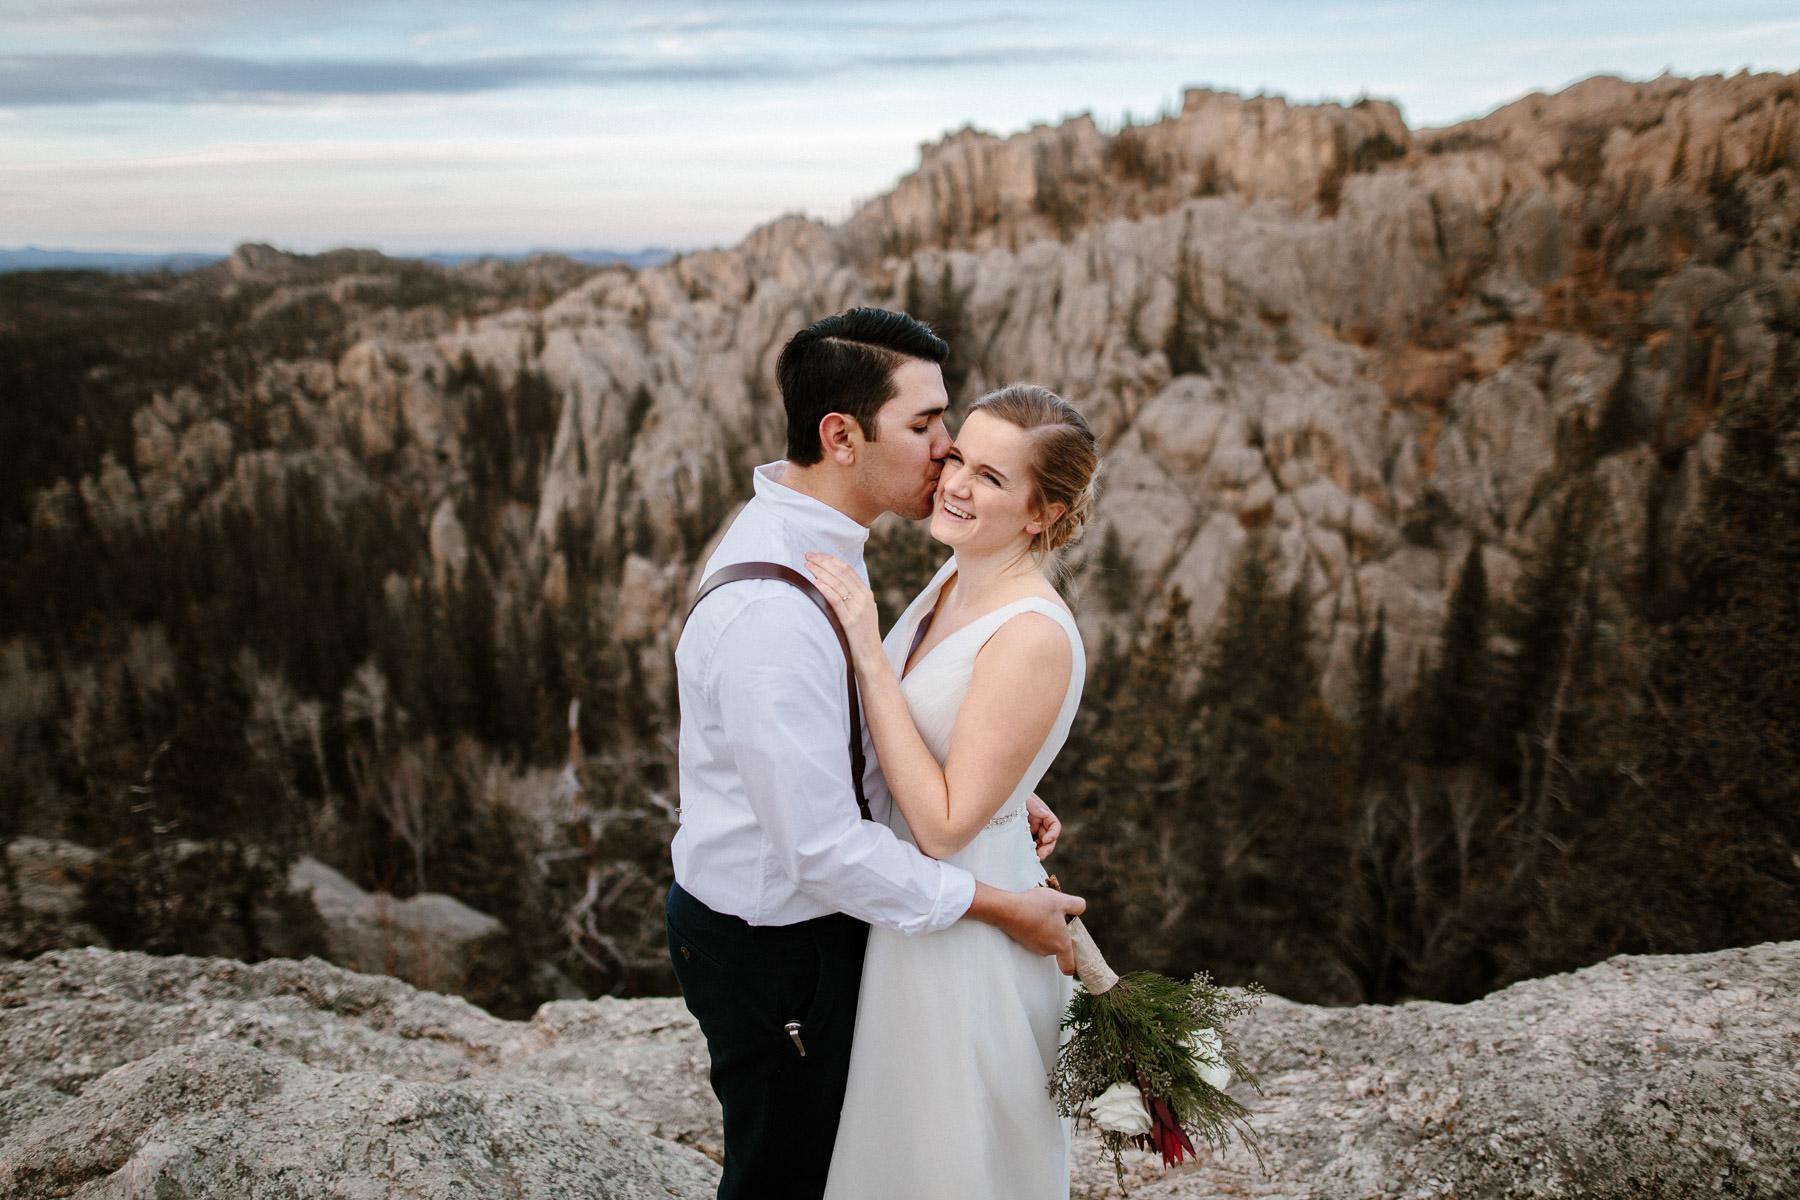 sioux-falls-black-hills-rapid-city-elopement-wedding-adventure-photographer-custer-sylvan-lake-47.jpg